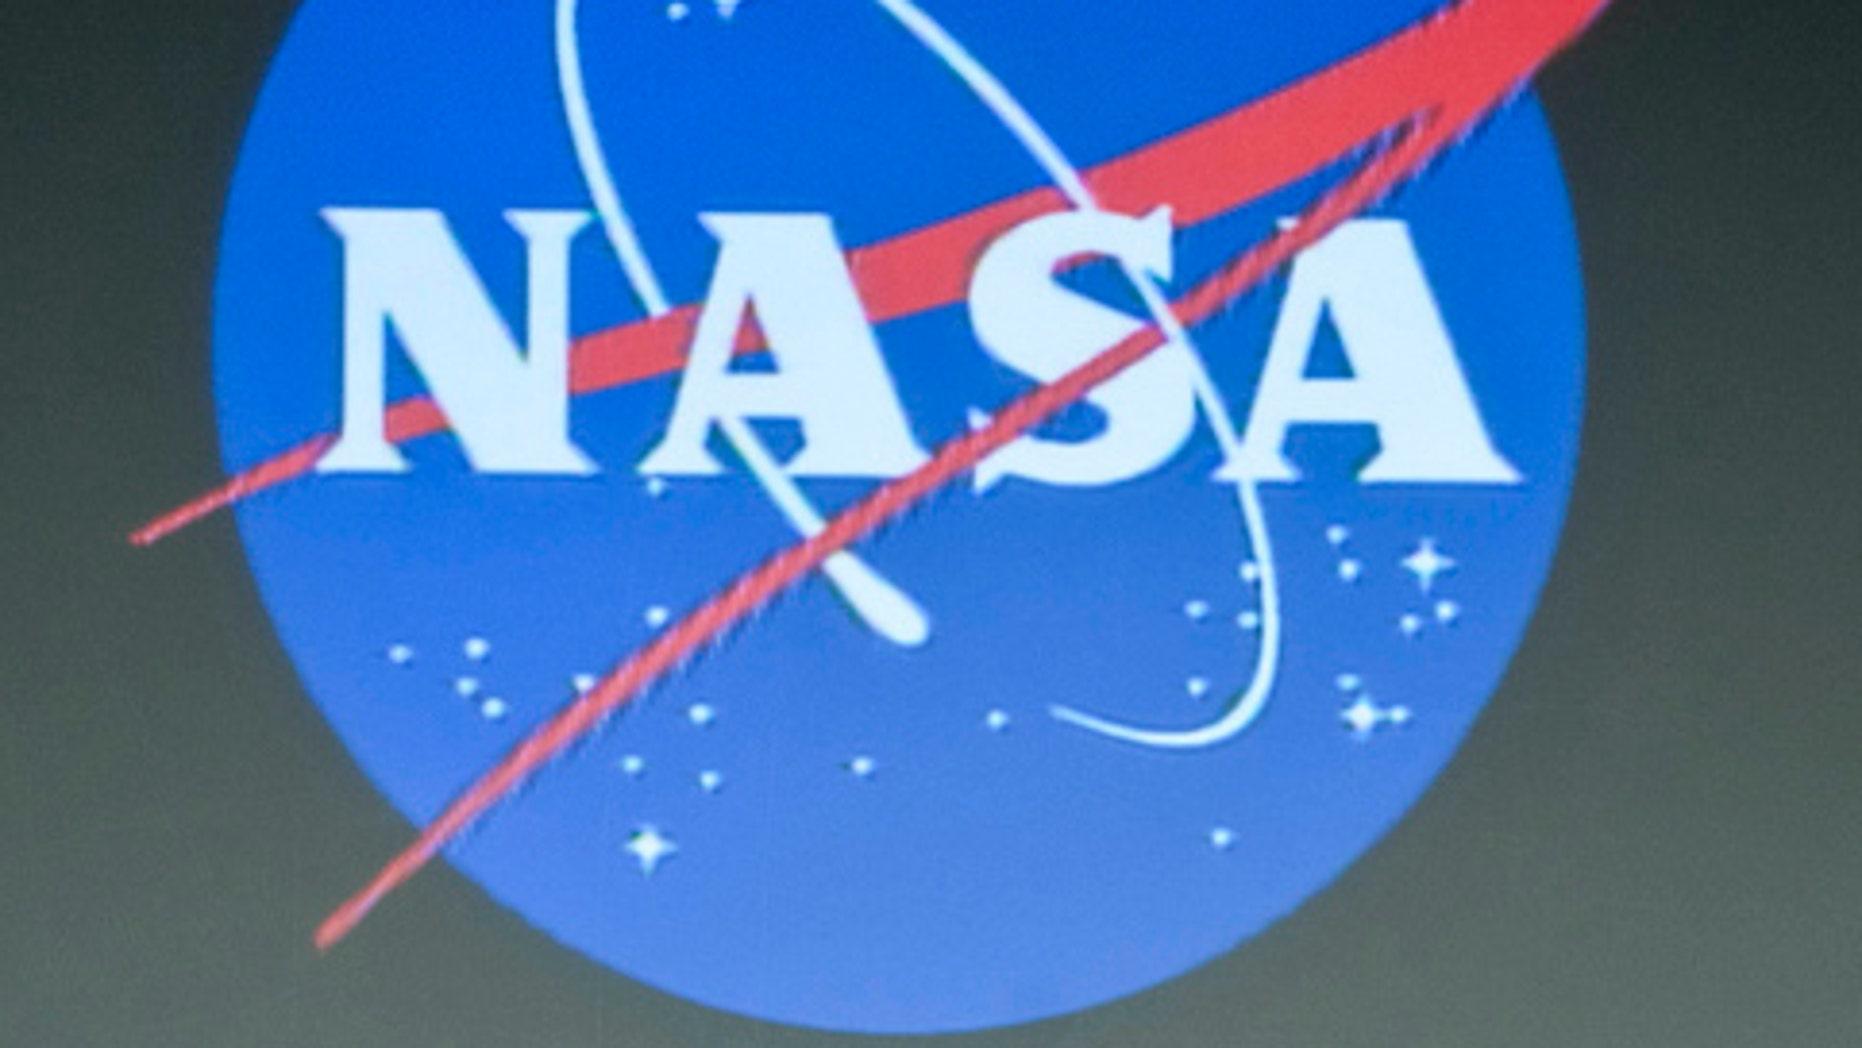 The logo of NASA, the National Aeronautics and Space Administration.